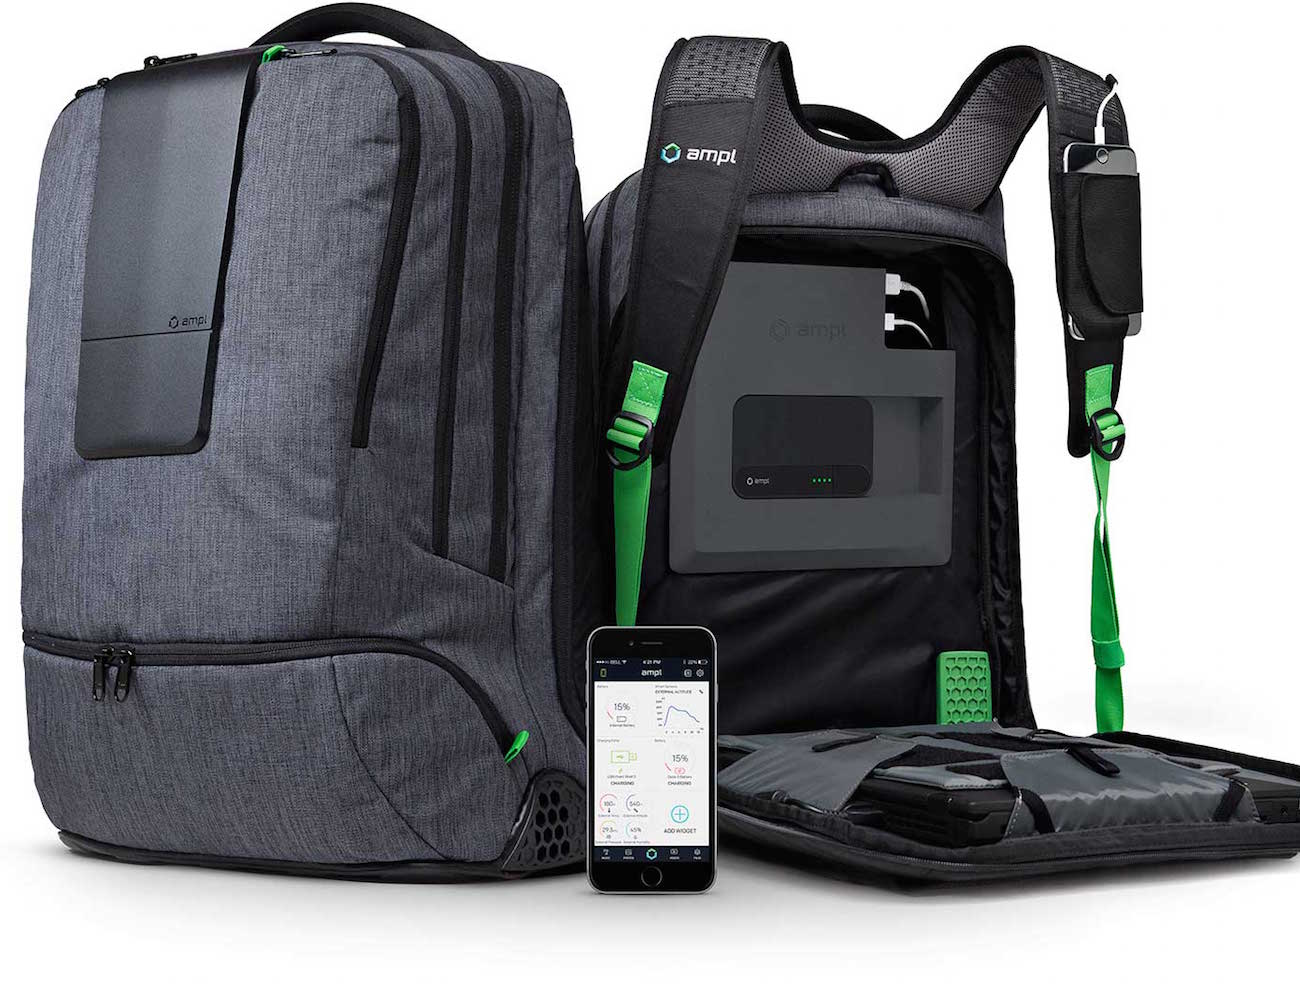 AMPL – The World's Smartest Backpack